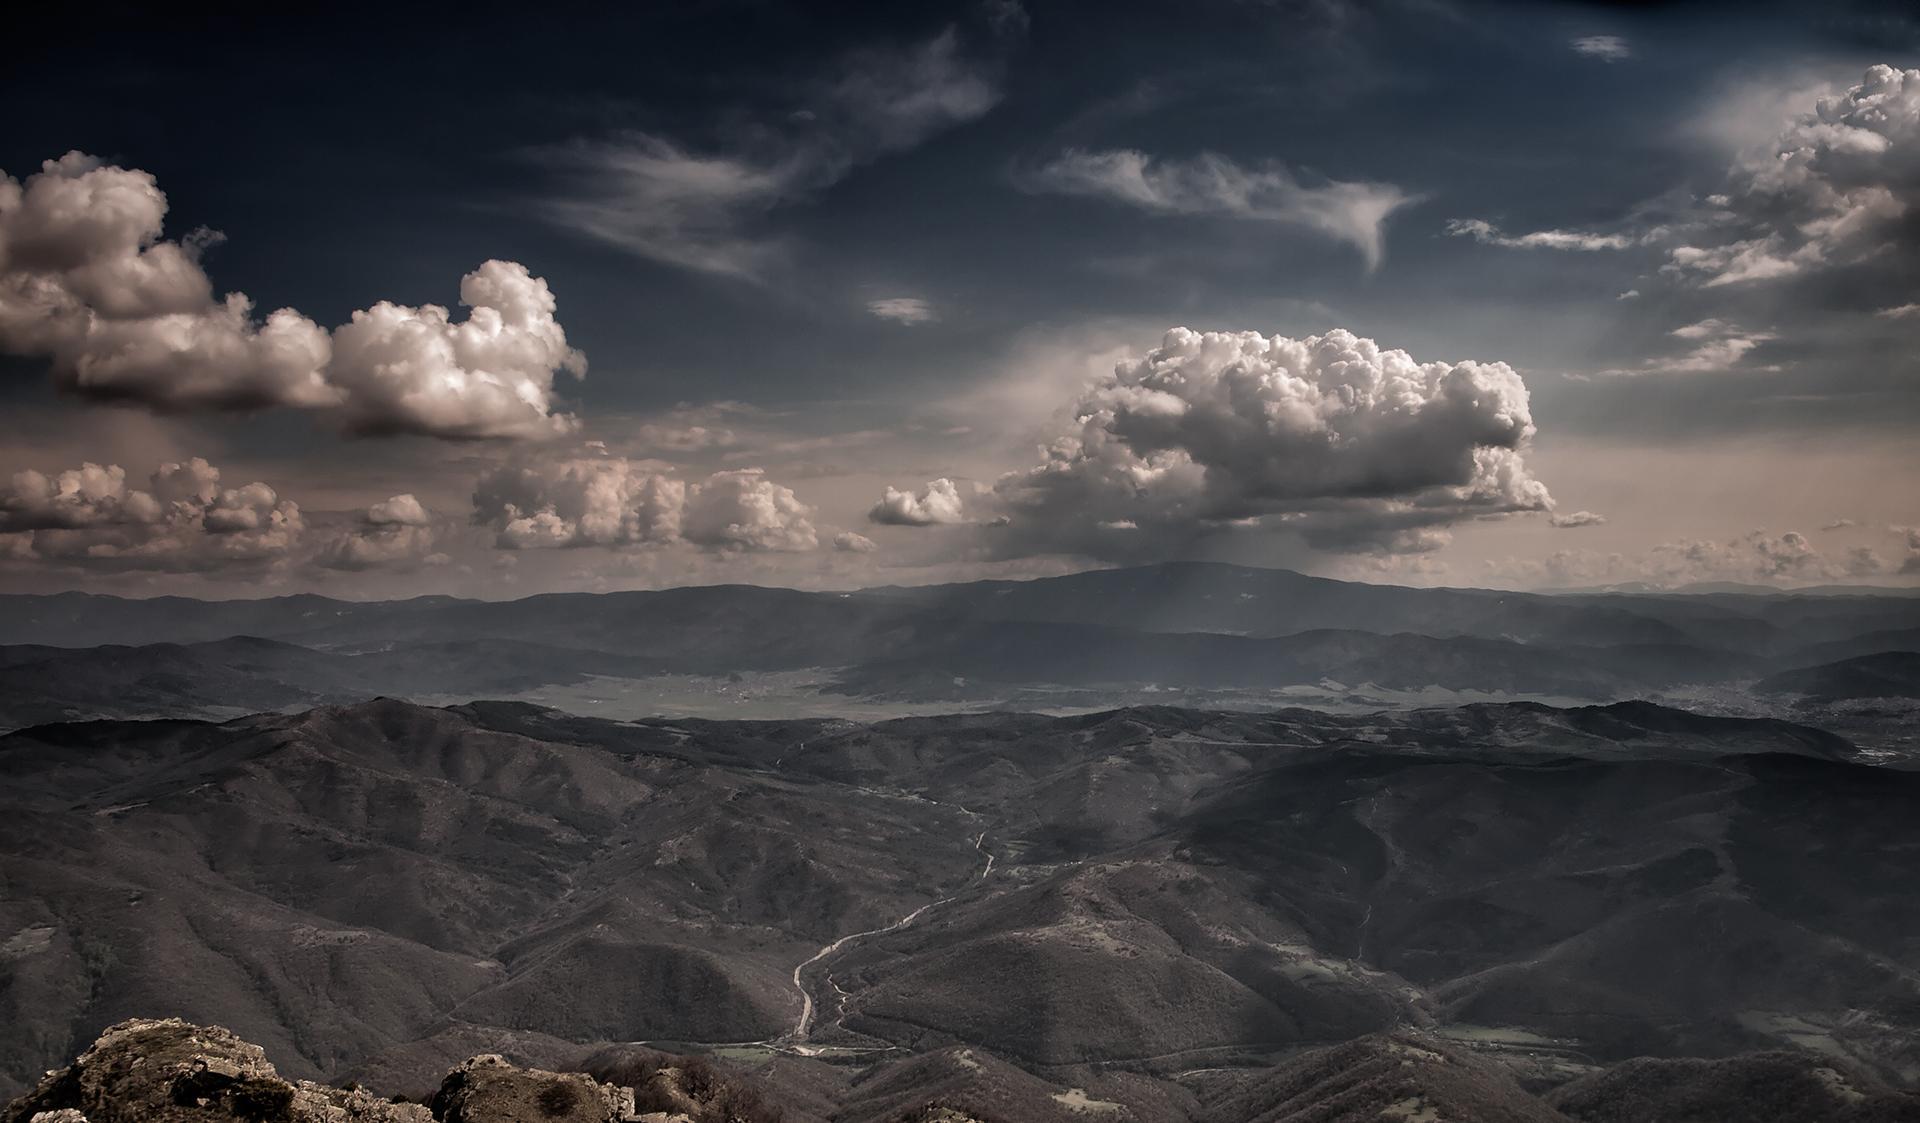 Photo Credit: http://morguefile.com/search/morguefile/3/storm/pop